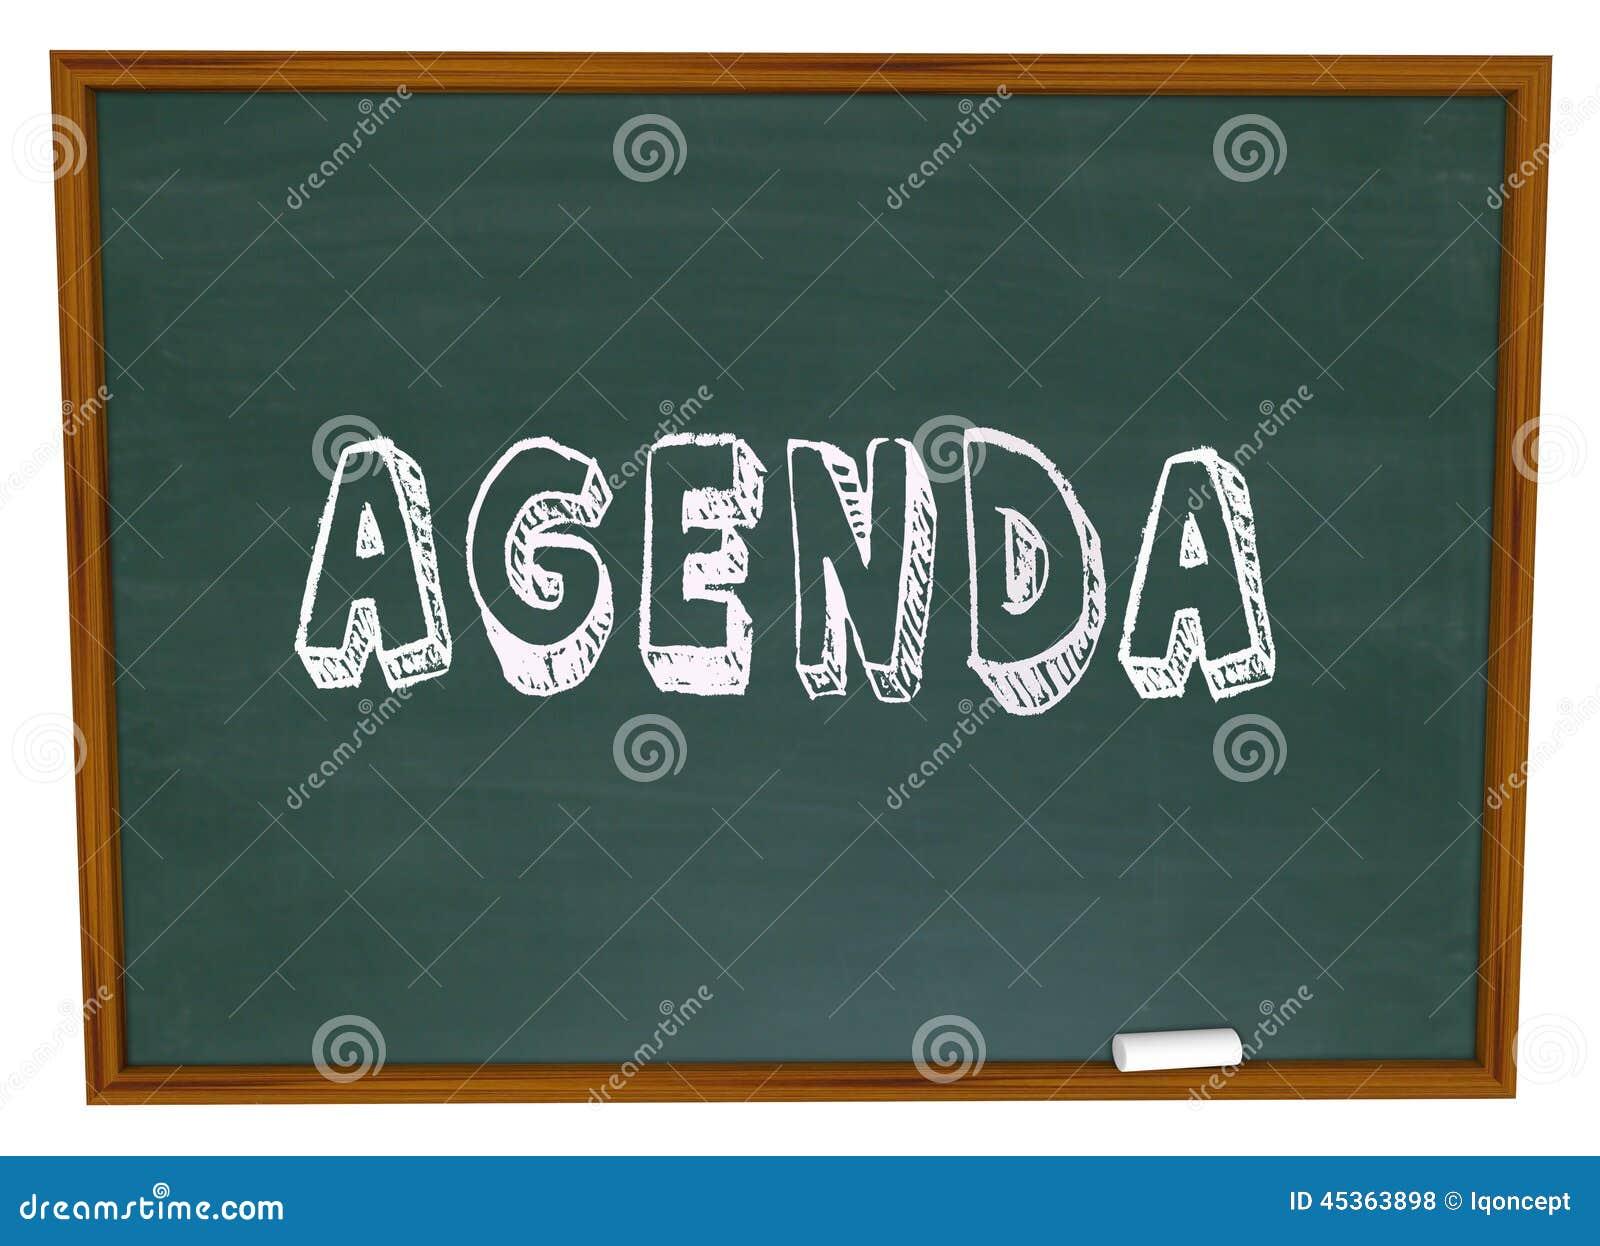 Classroom Based Web Design Course ~ Agenda schedule word chalkboard school class lesson